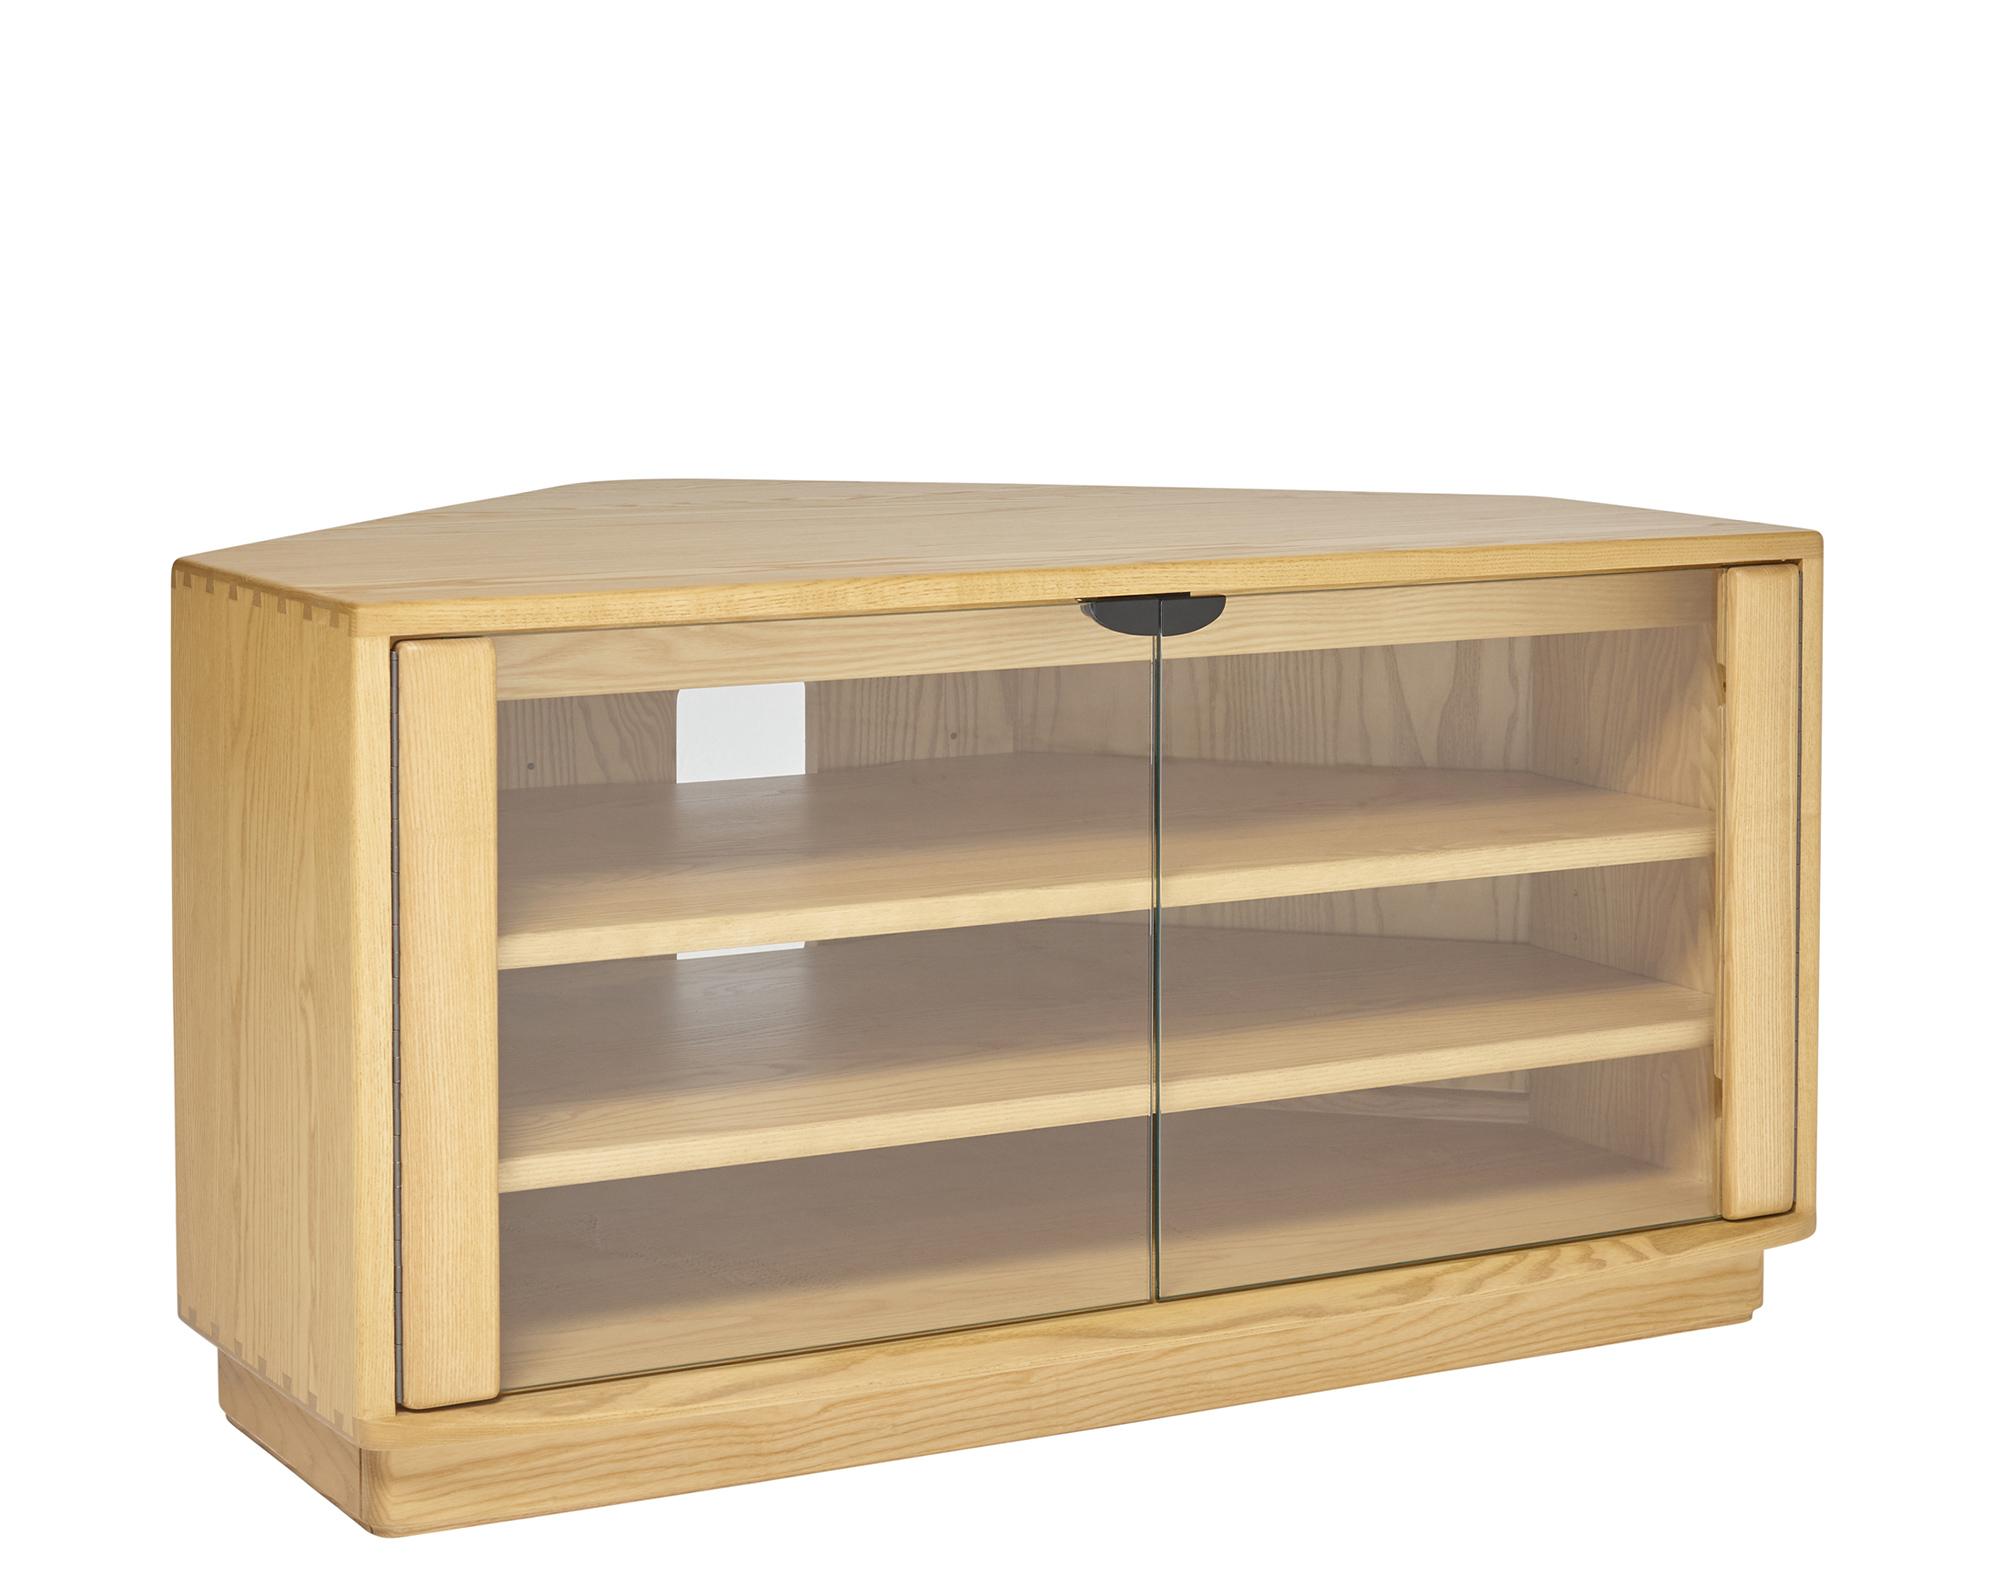 ercol style tv cabinet. Black Bedroom Furniture Sets. Home Design Ideas